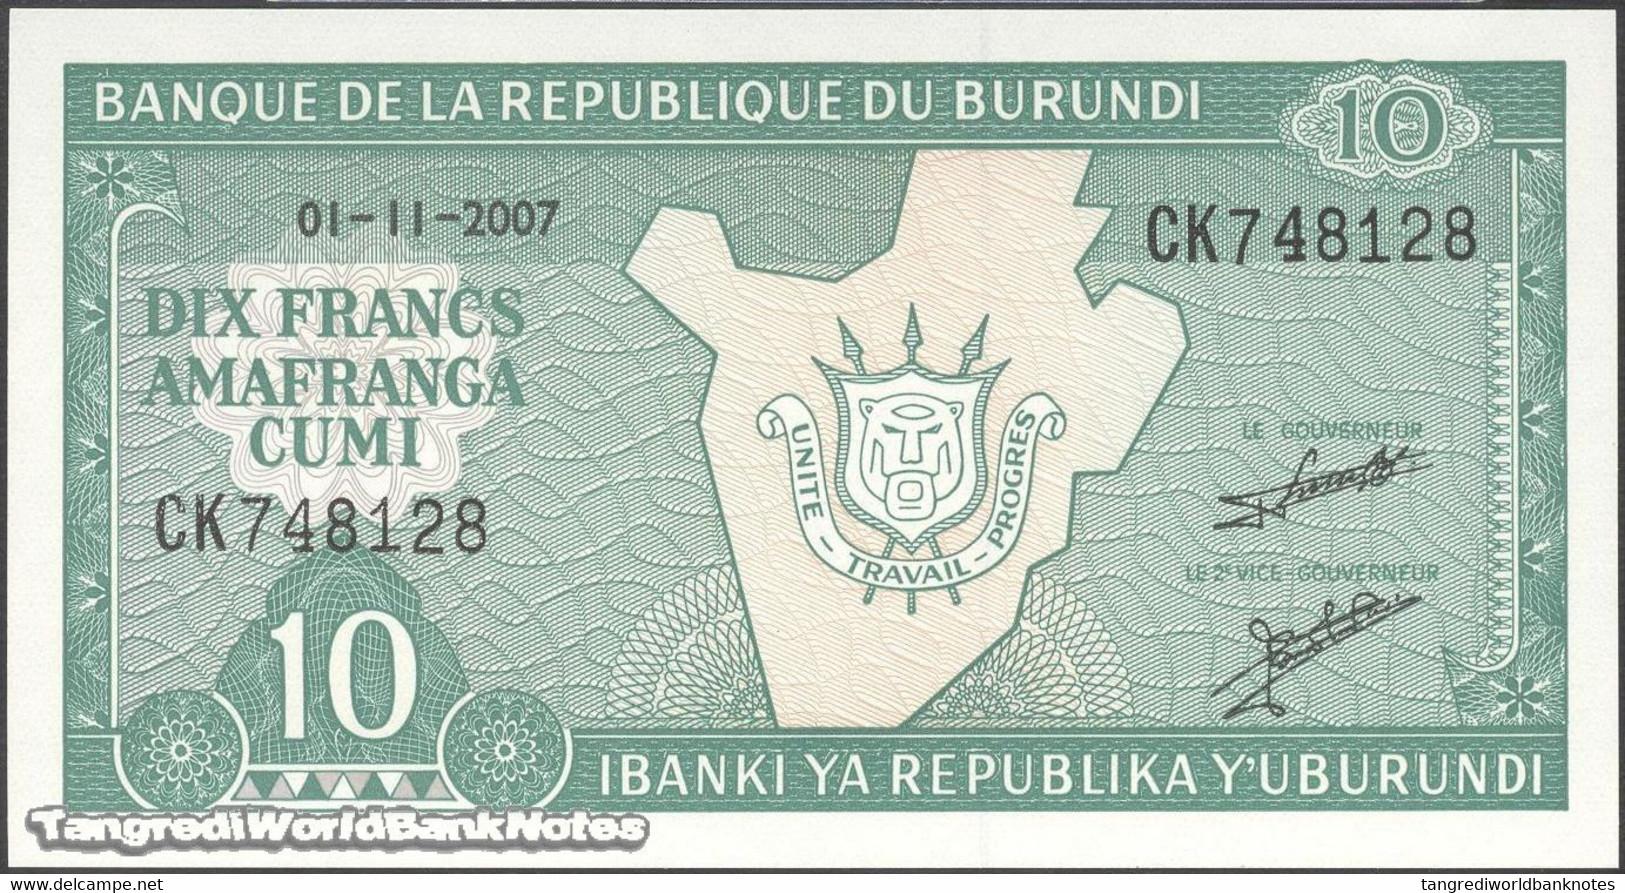 TWN - BURUNDI 33e2 - 10 Francs 1.11.2007 Prefix CK UNC - Burundi